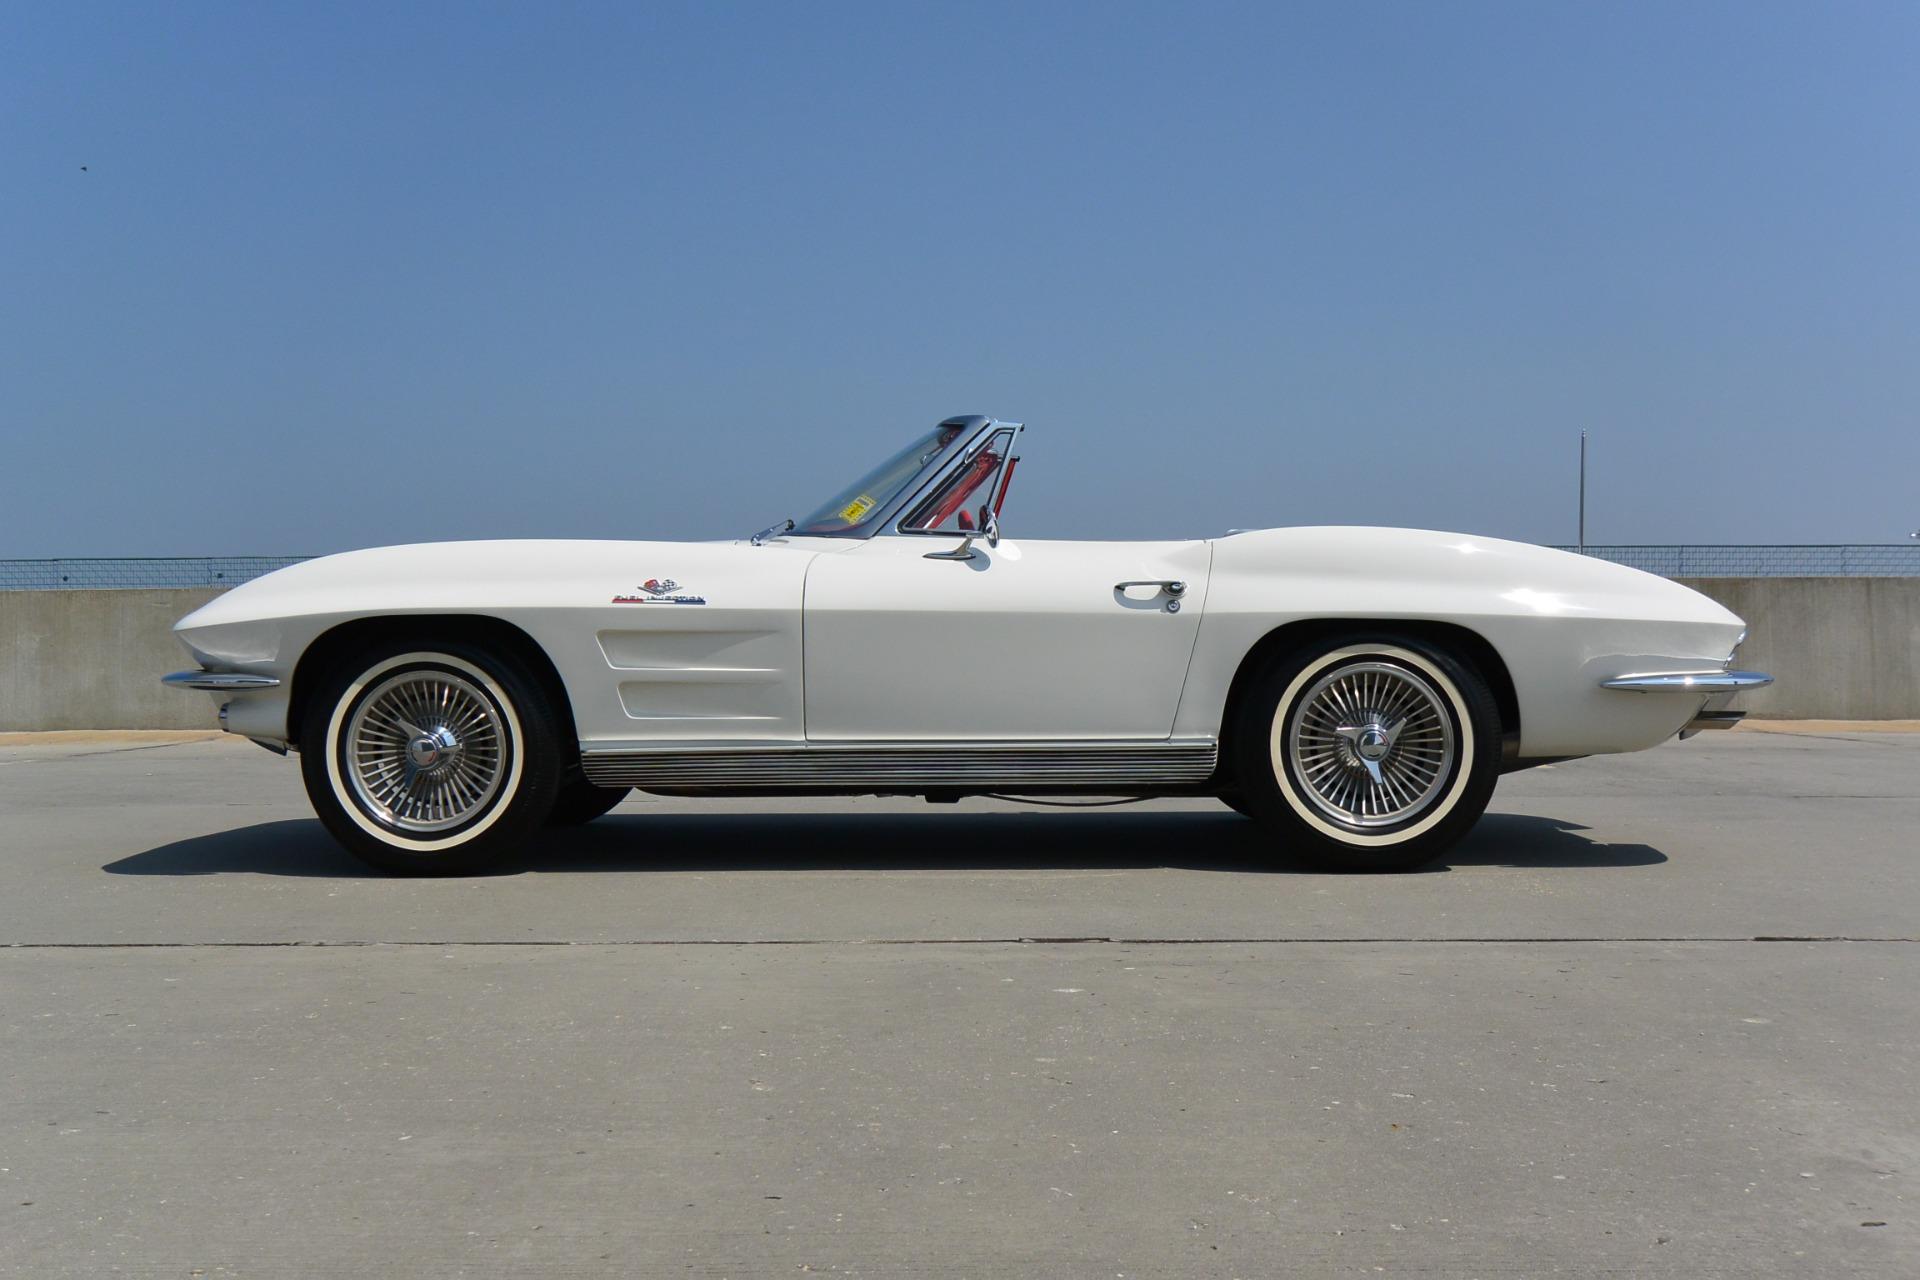 Used 1963 Chevrolet Corvette Convertible Jackson Ms Car Sold